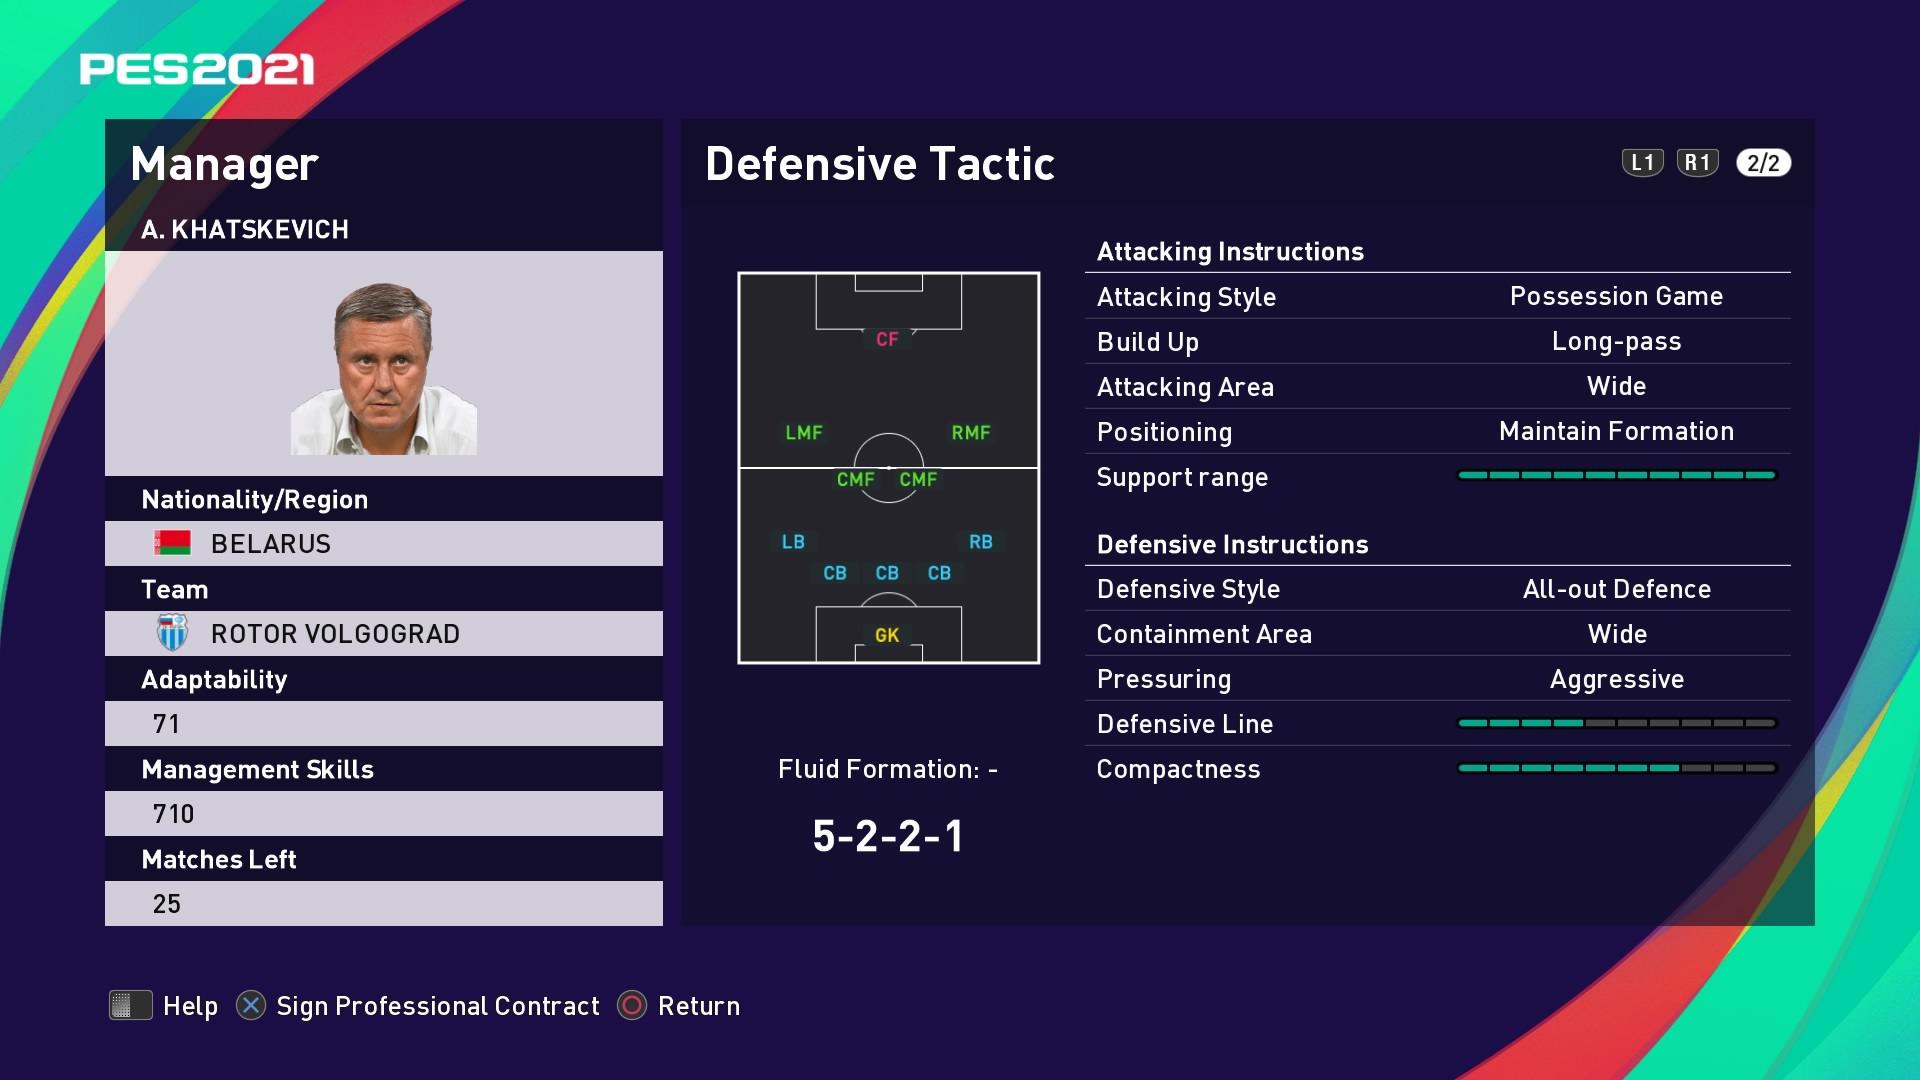 A. Khatskevich (Aliaksandr Khatskevich) Defensive Tactic in PES 2021 myClub